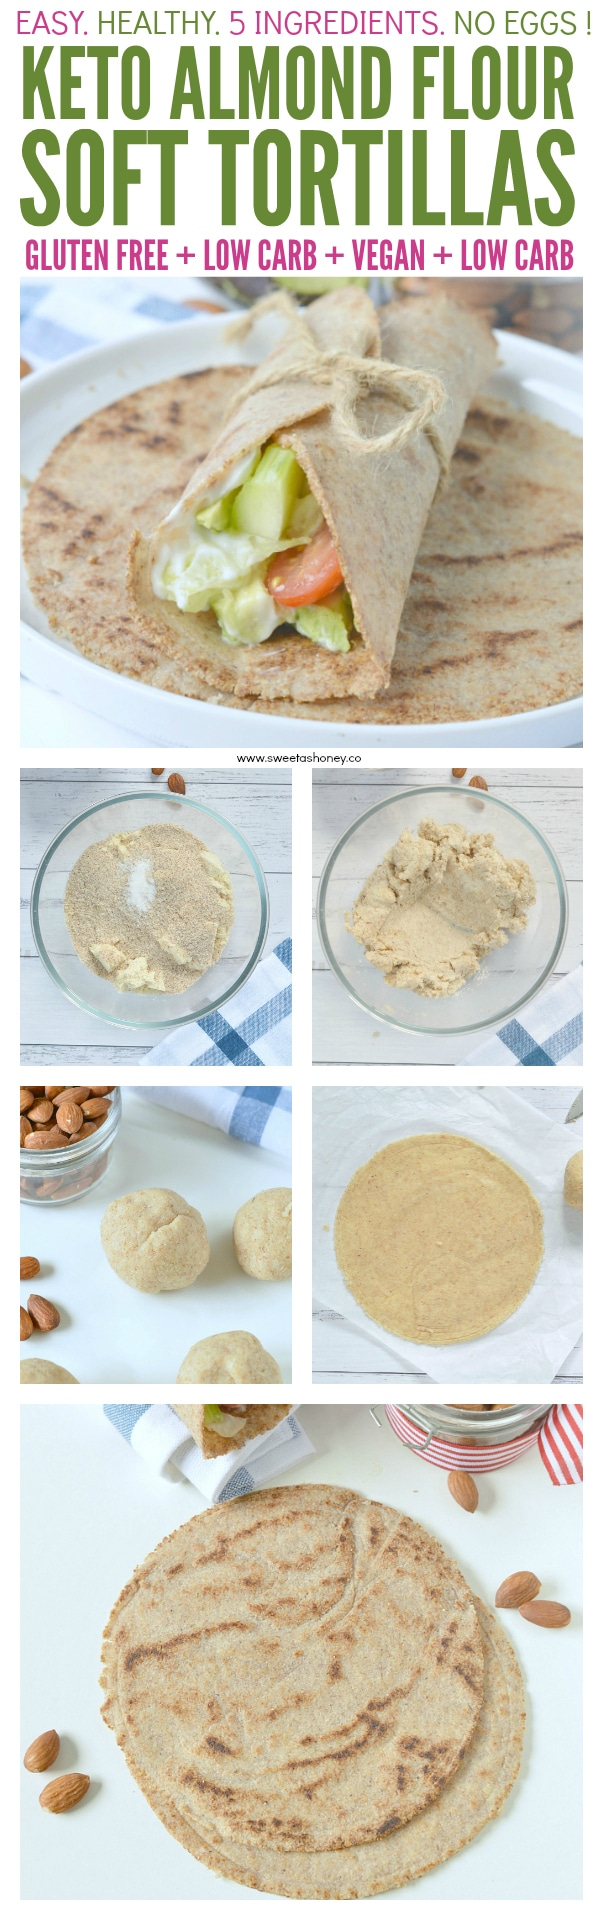 Almond flour tortillas keto soft tortillas